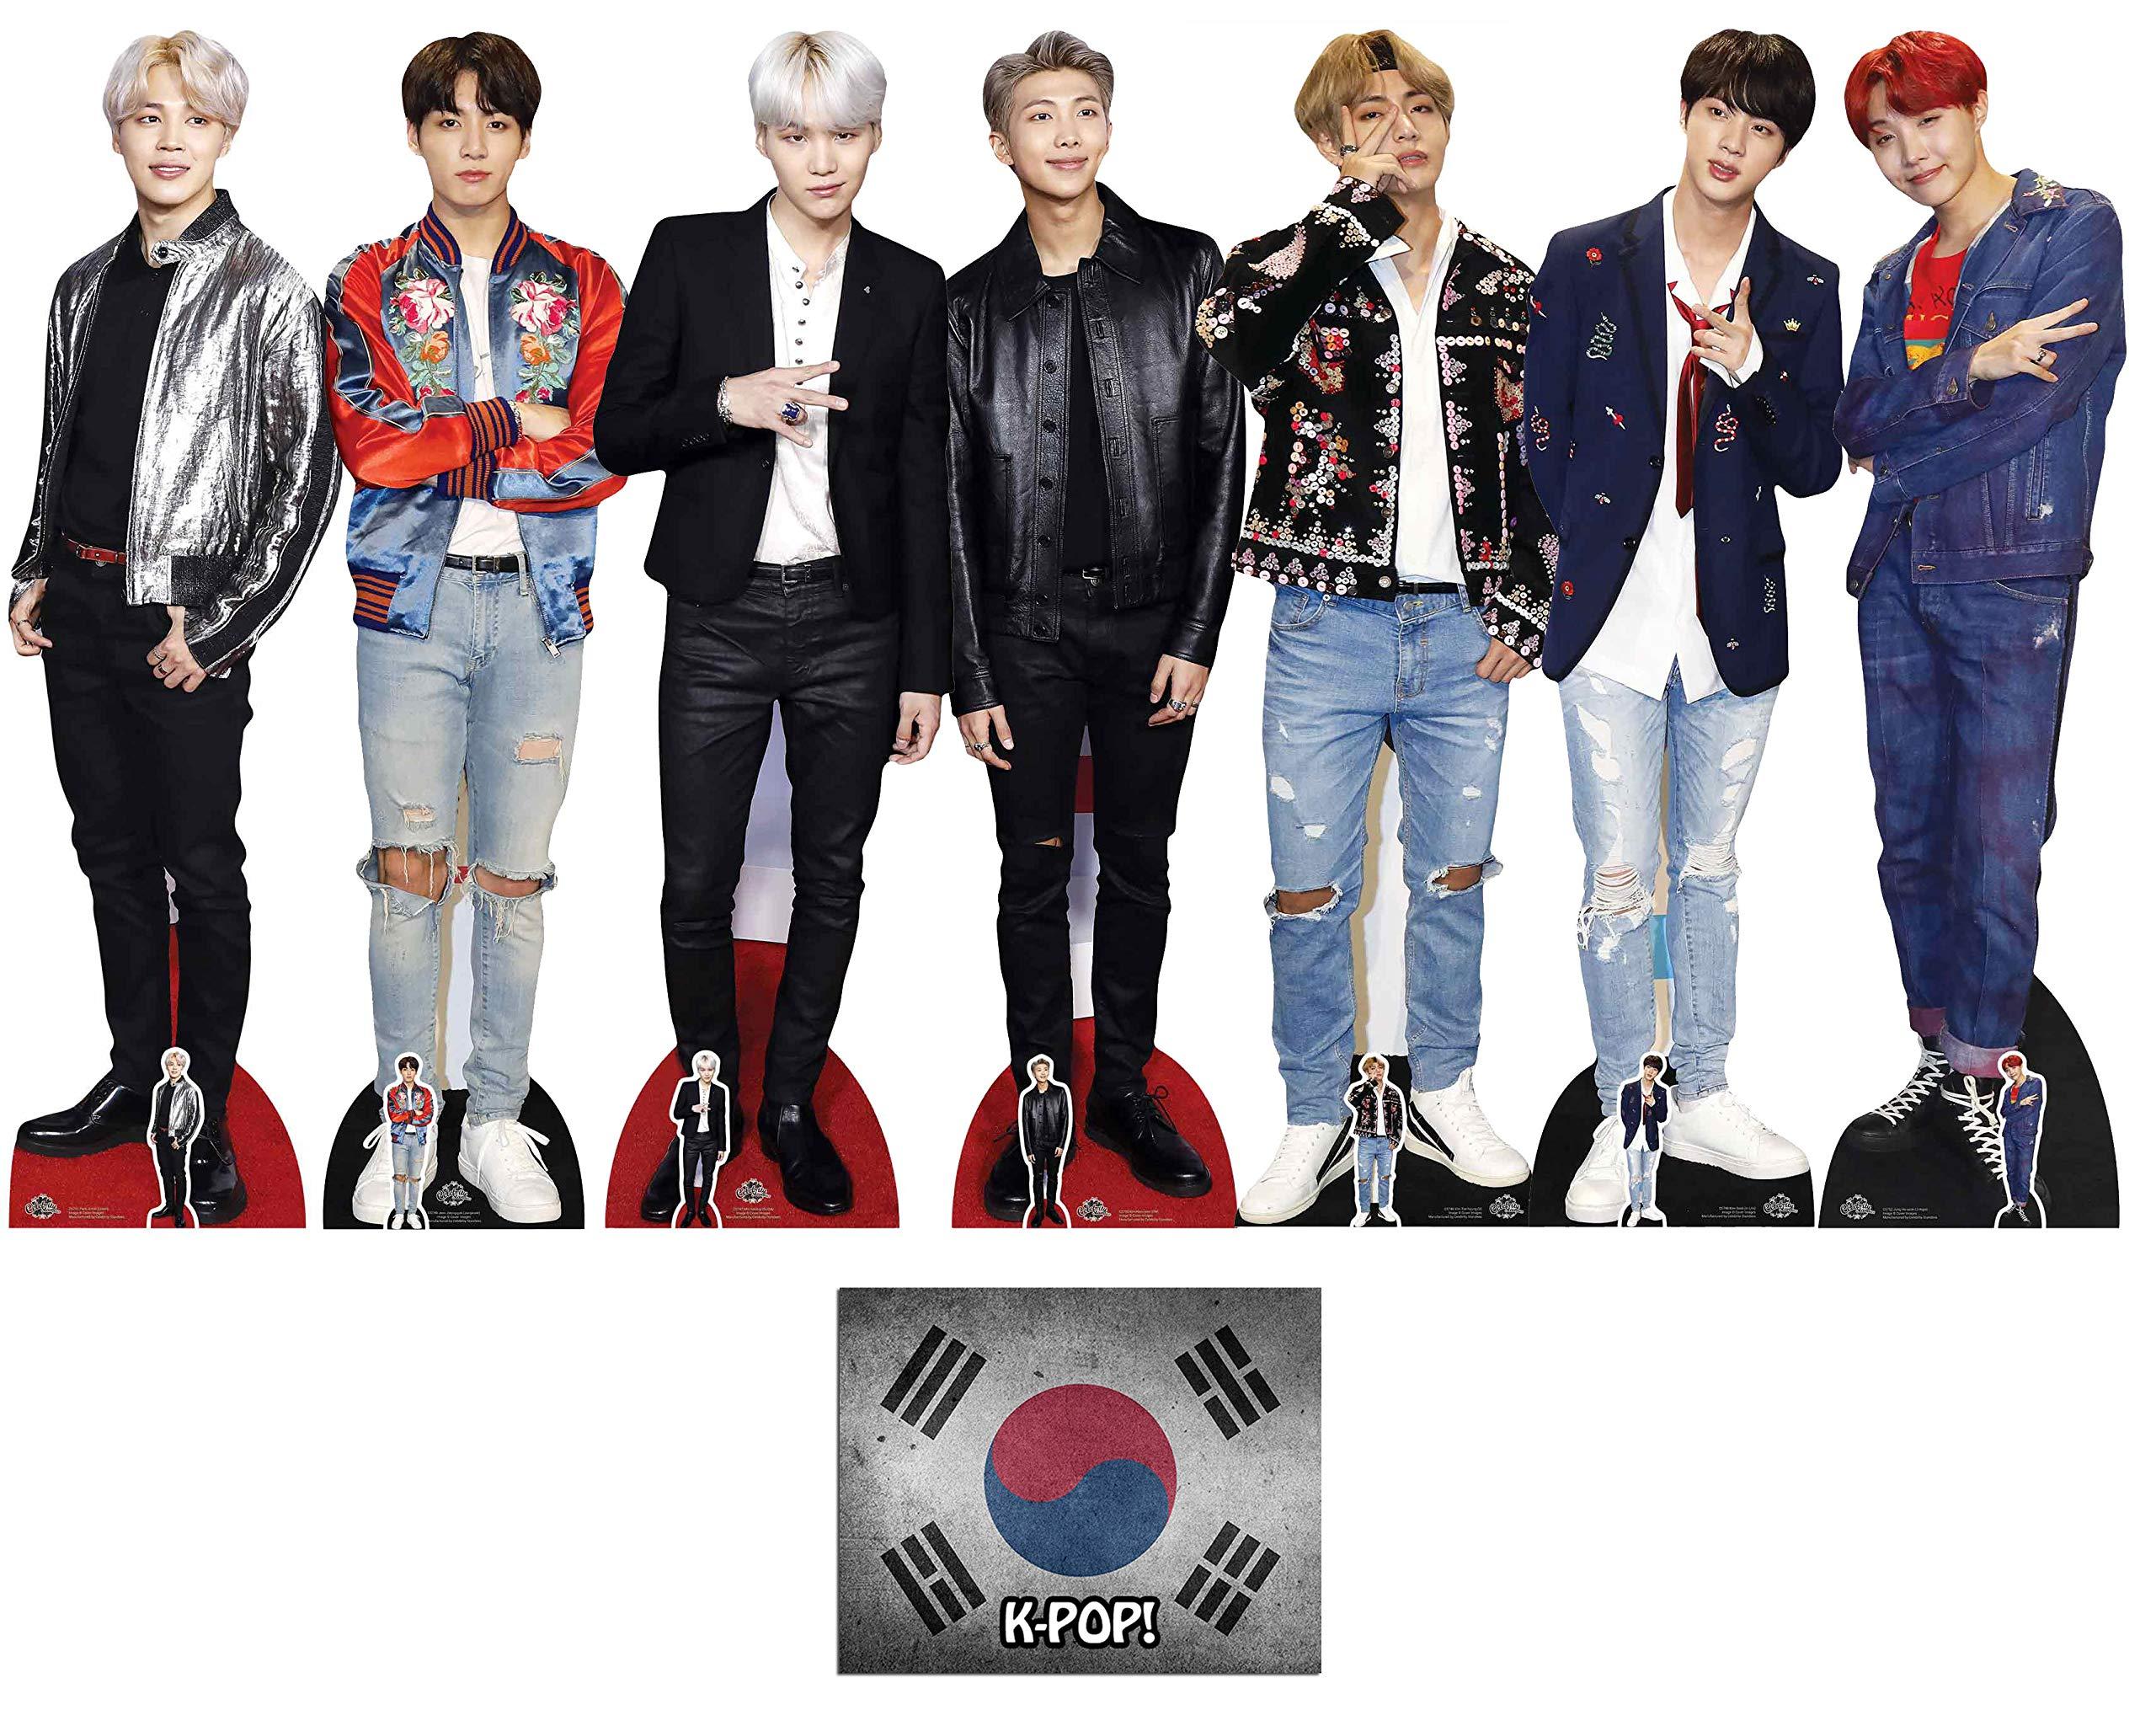 Bangtan Boys with V, Suga, Jin, Jungkook, RM, Jimin and J-Hope Set of 7 Lifesize and Mini Cardboard Cutout Fan Pack, Includes 8x10 Star Photo